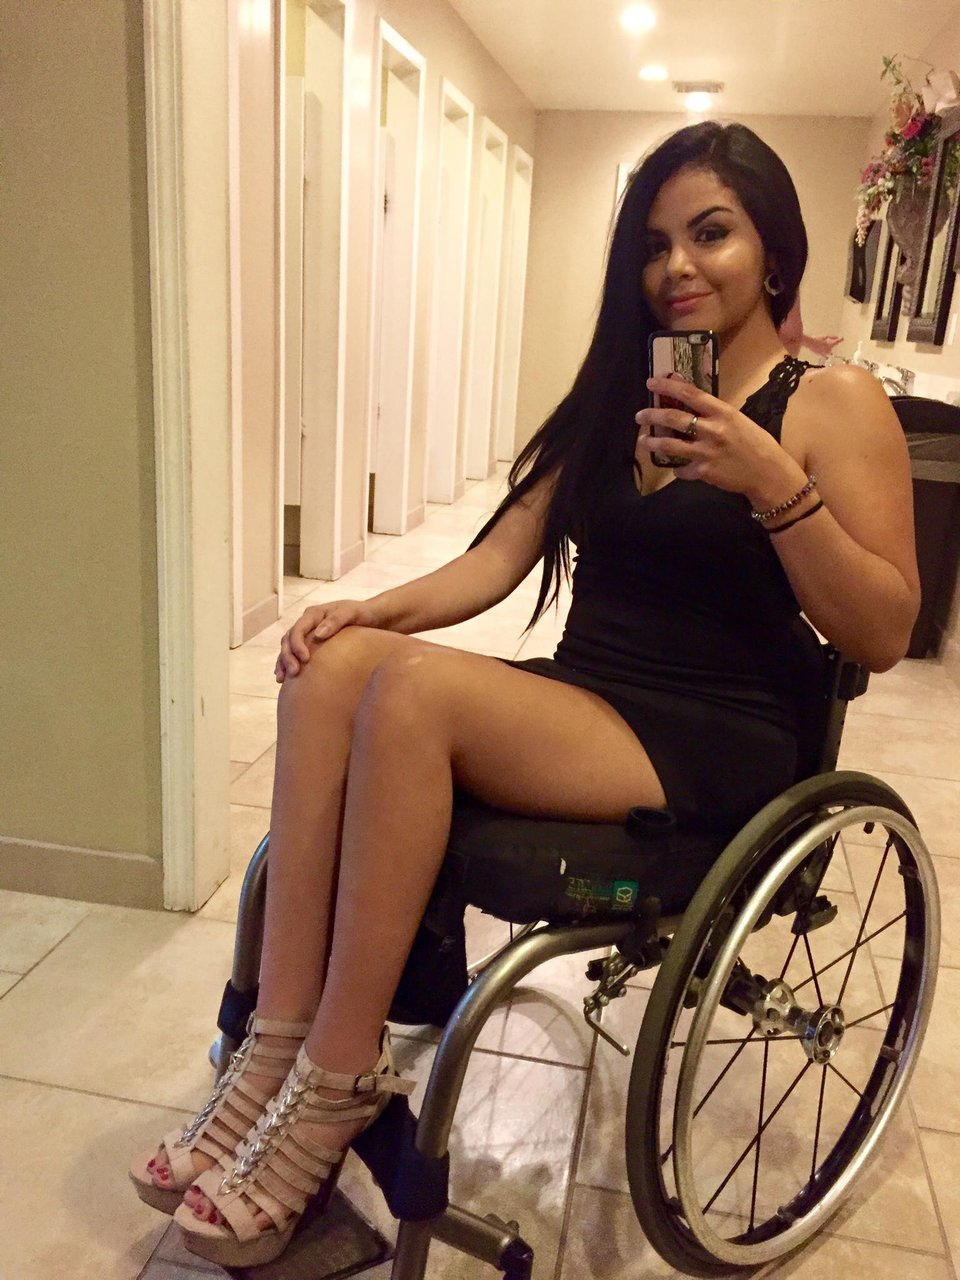 Wheelchair Girls - Amputee Devotee